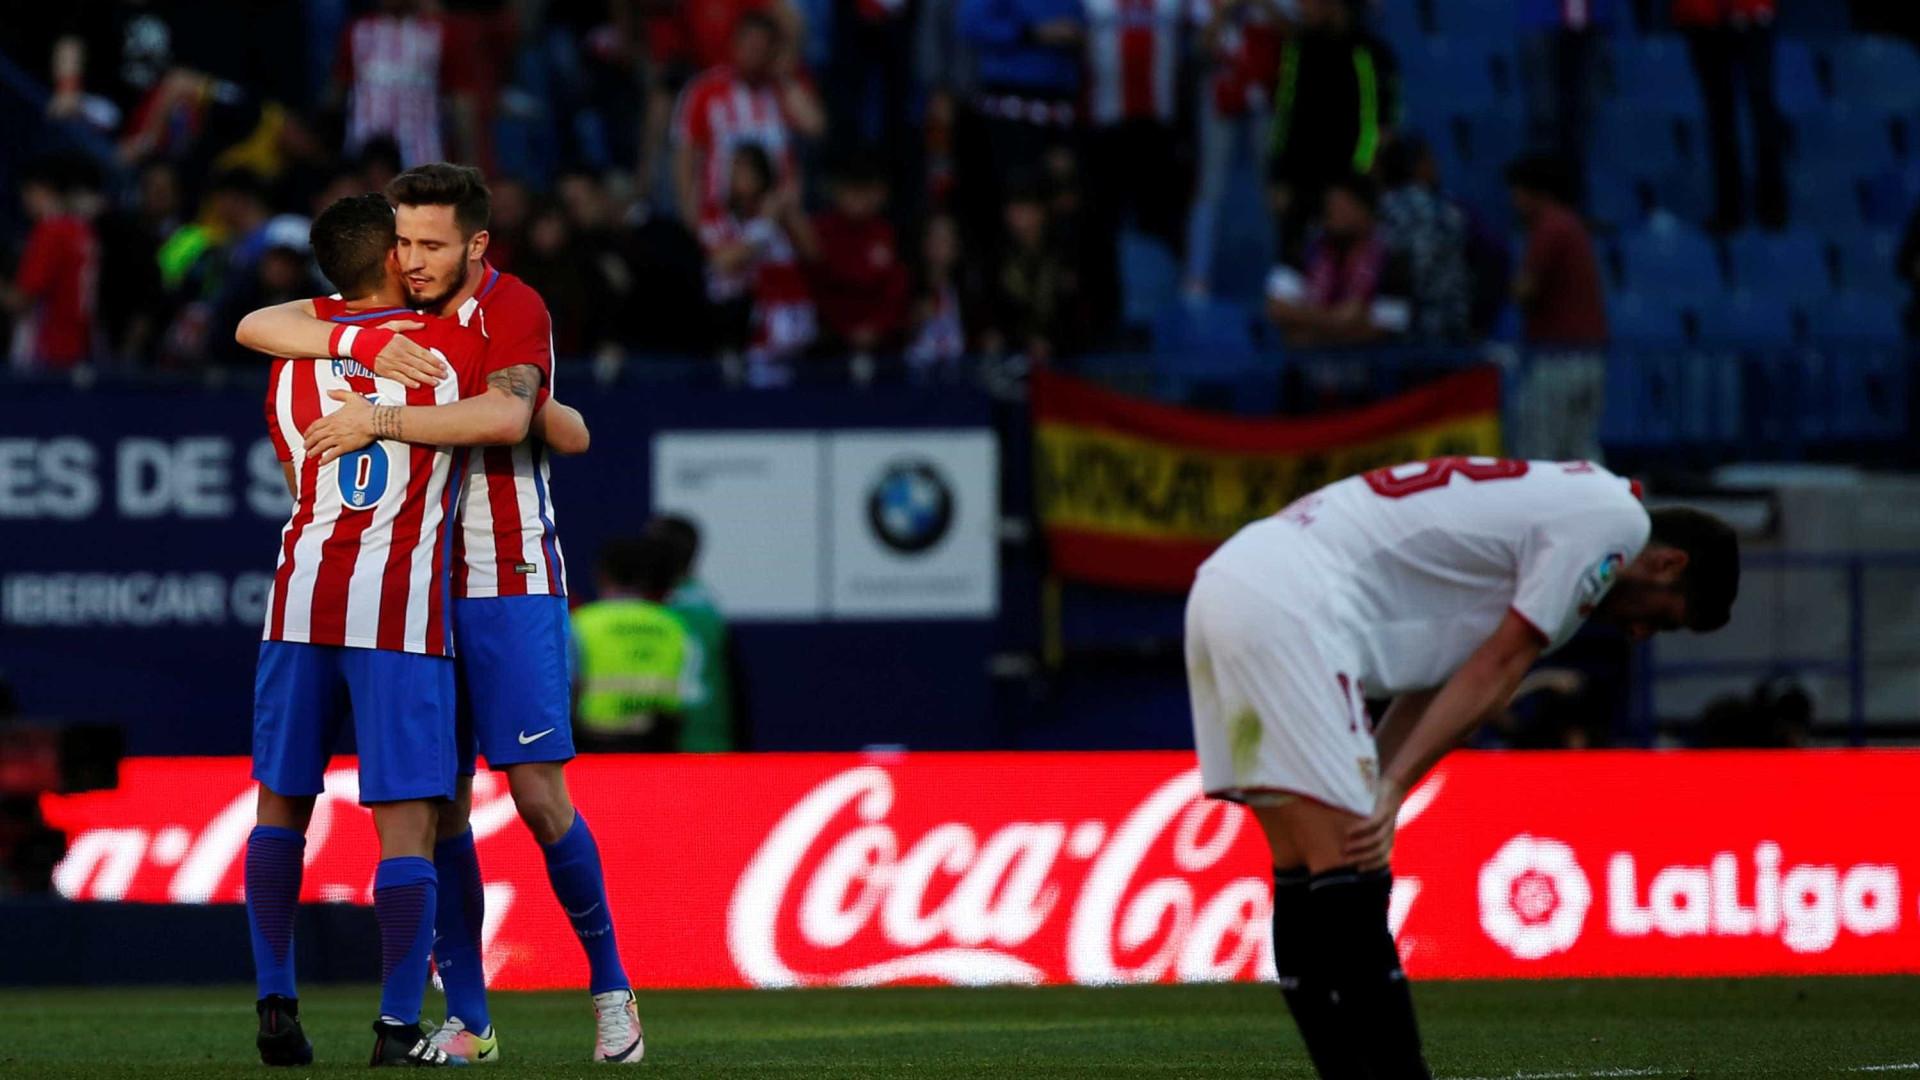 Atlético Madrid vence Sevilha e mantém-se na luta pela Champions